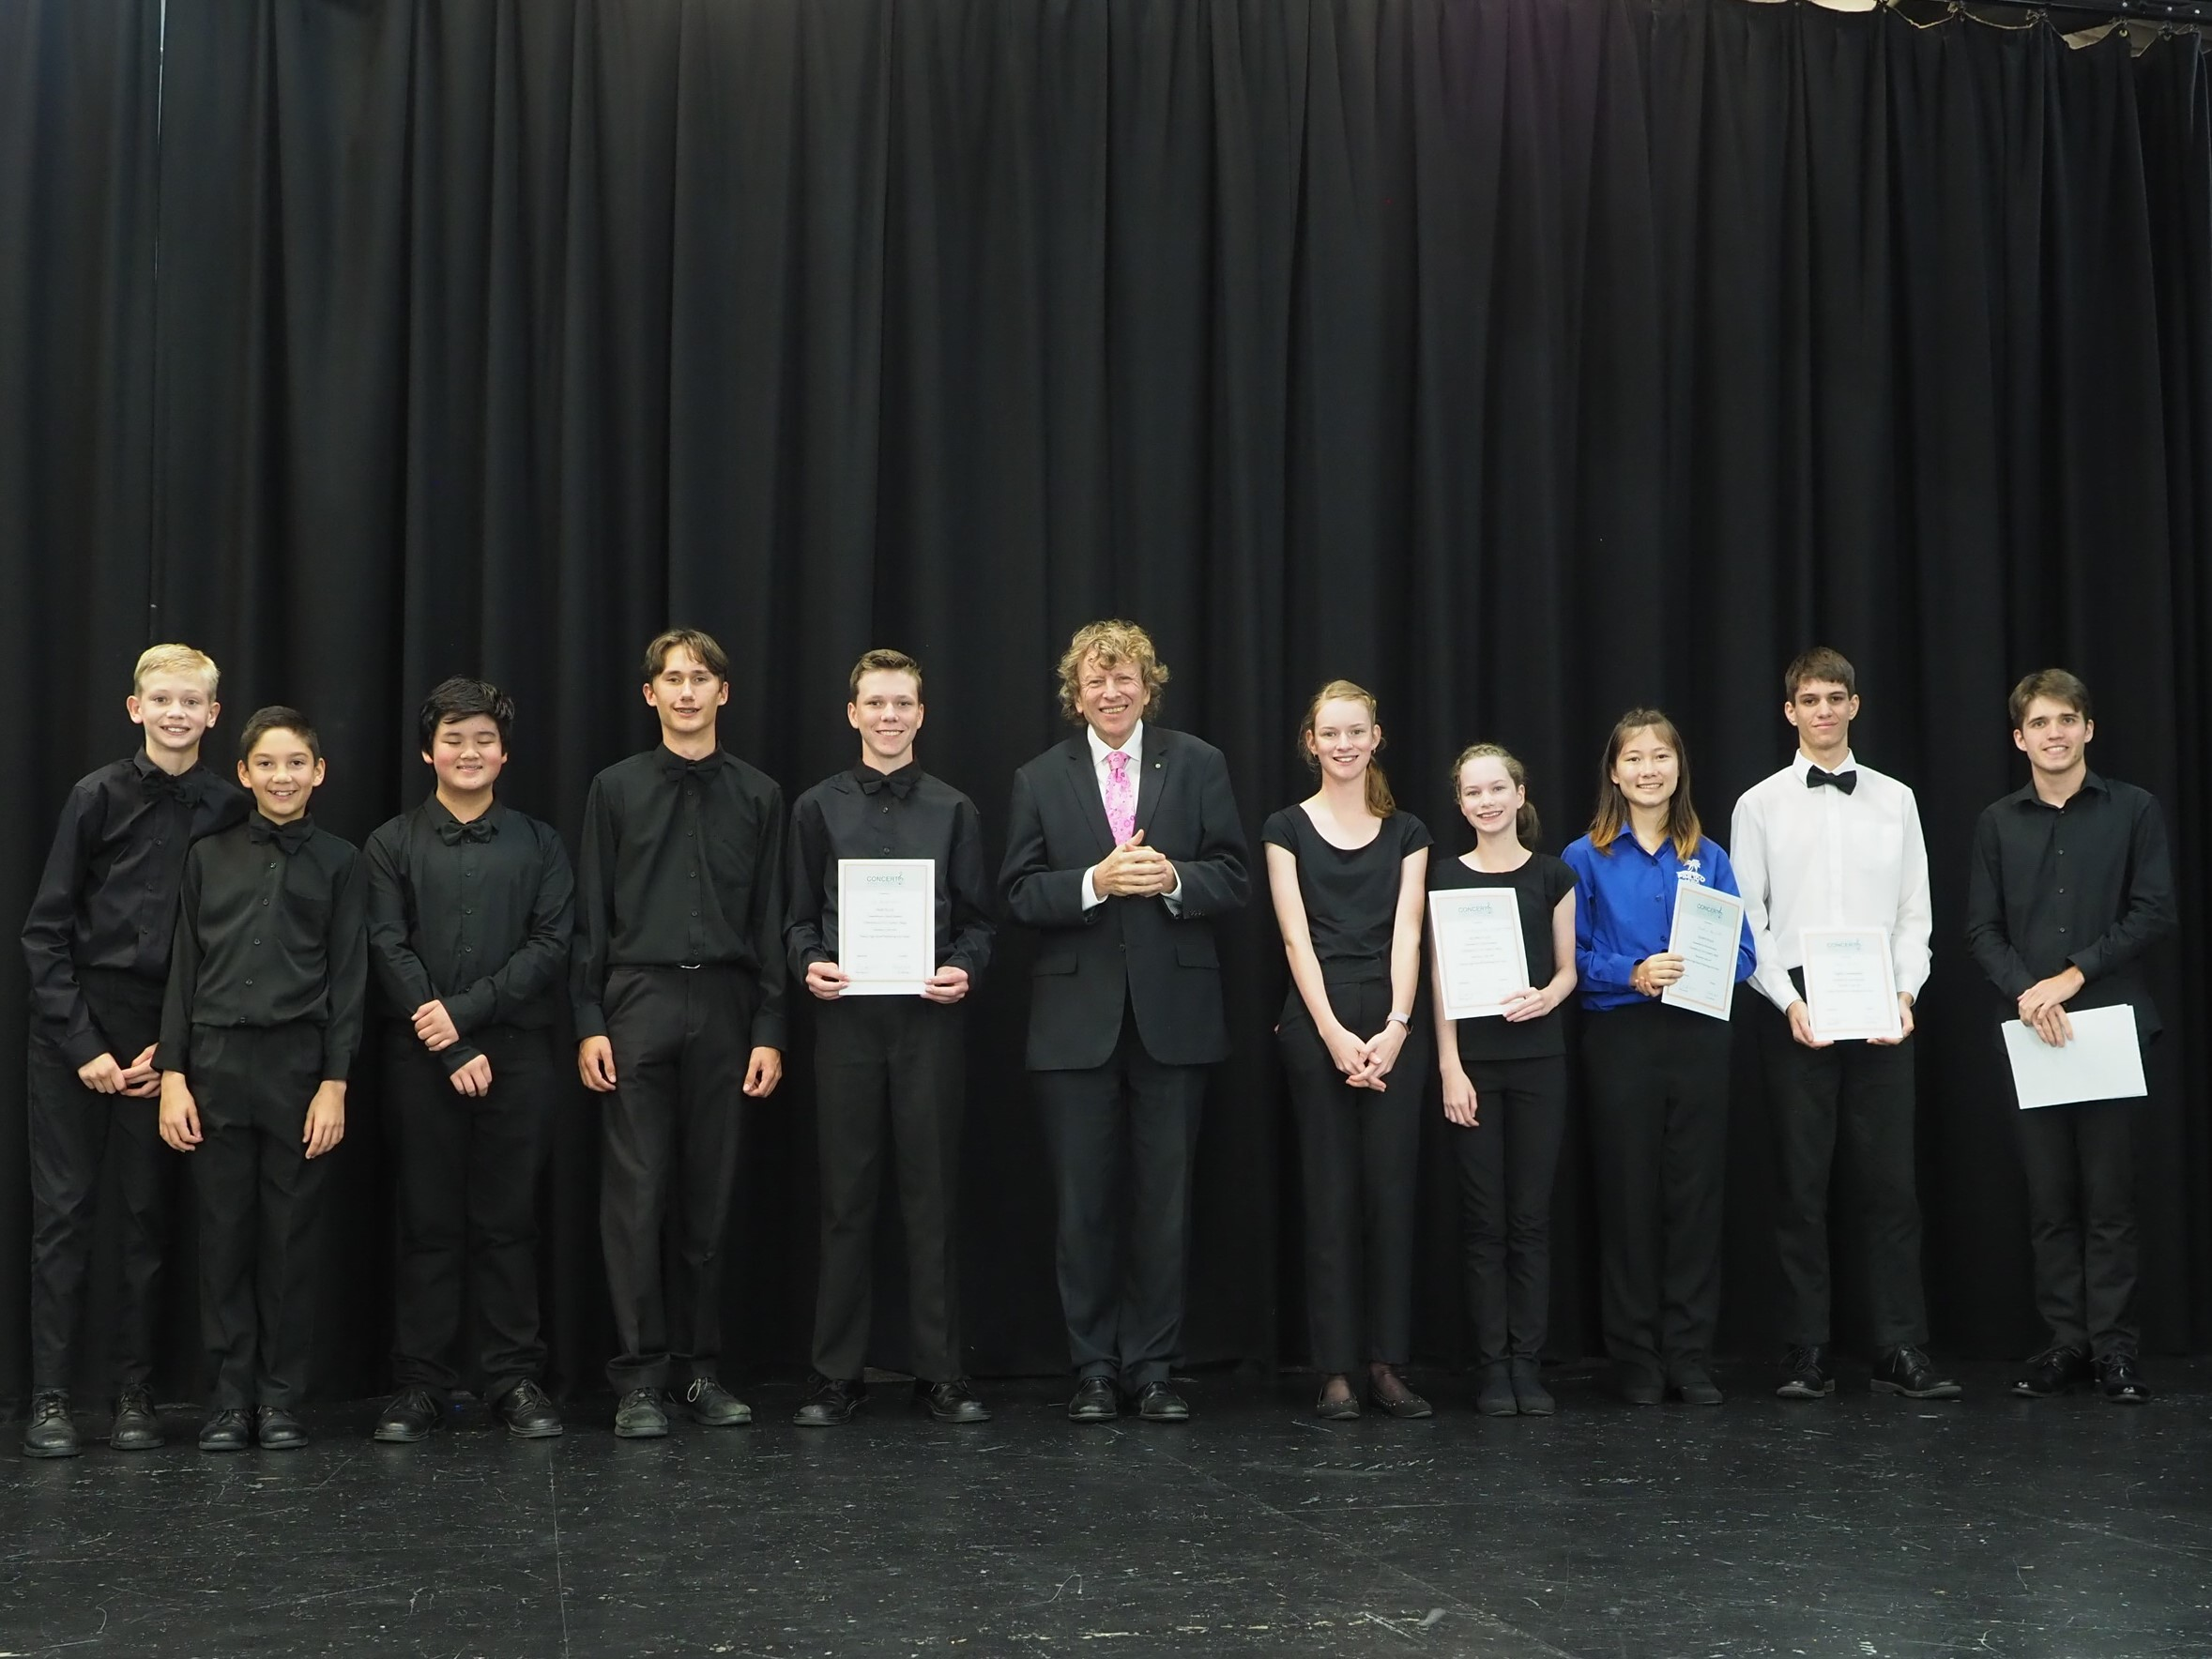 Prize winners with Piers Lane, Adjudicator